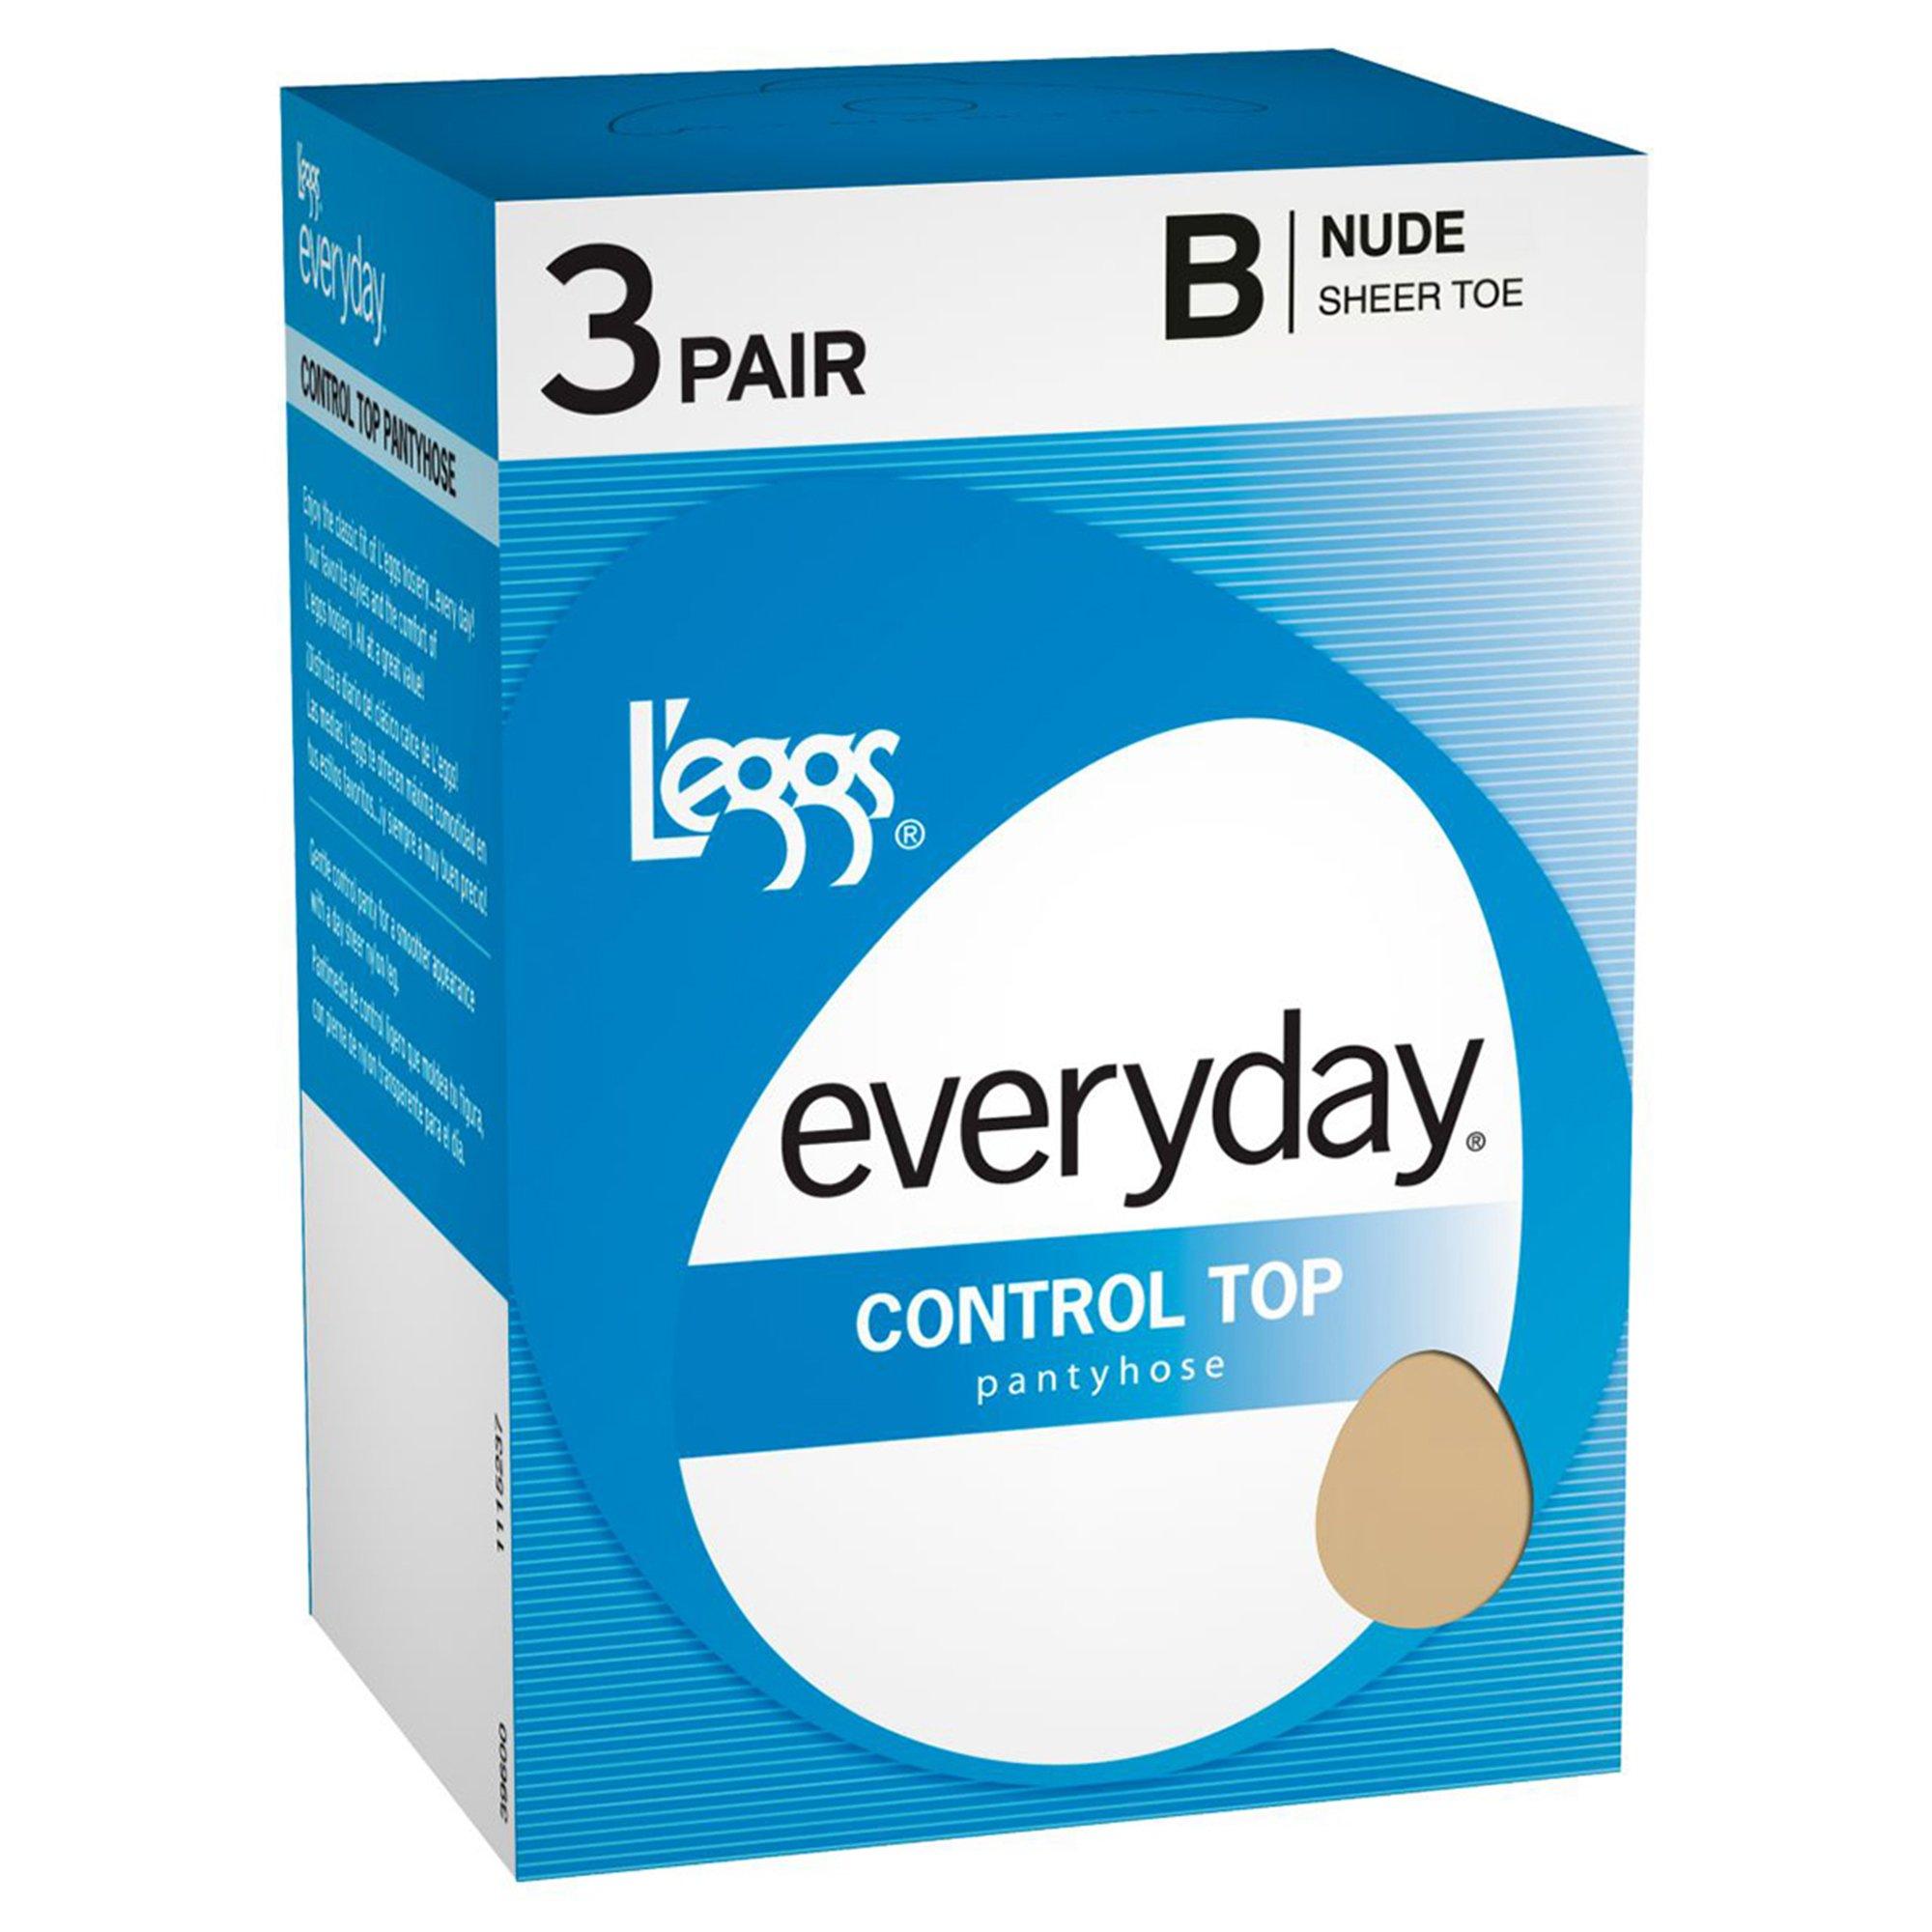 L'eggs Everyday Control Top ST 3 Pair_Suntan_B